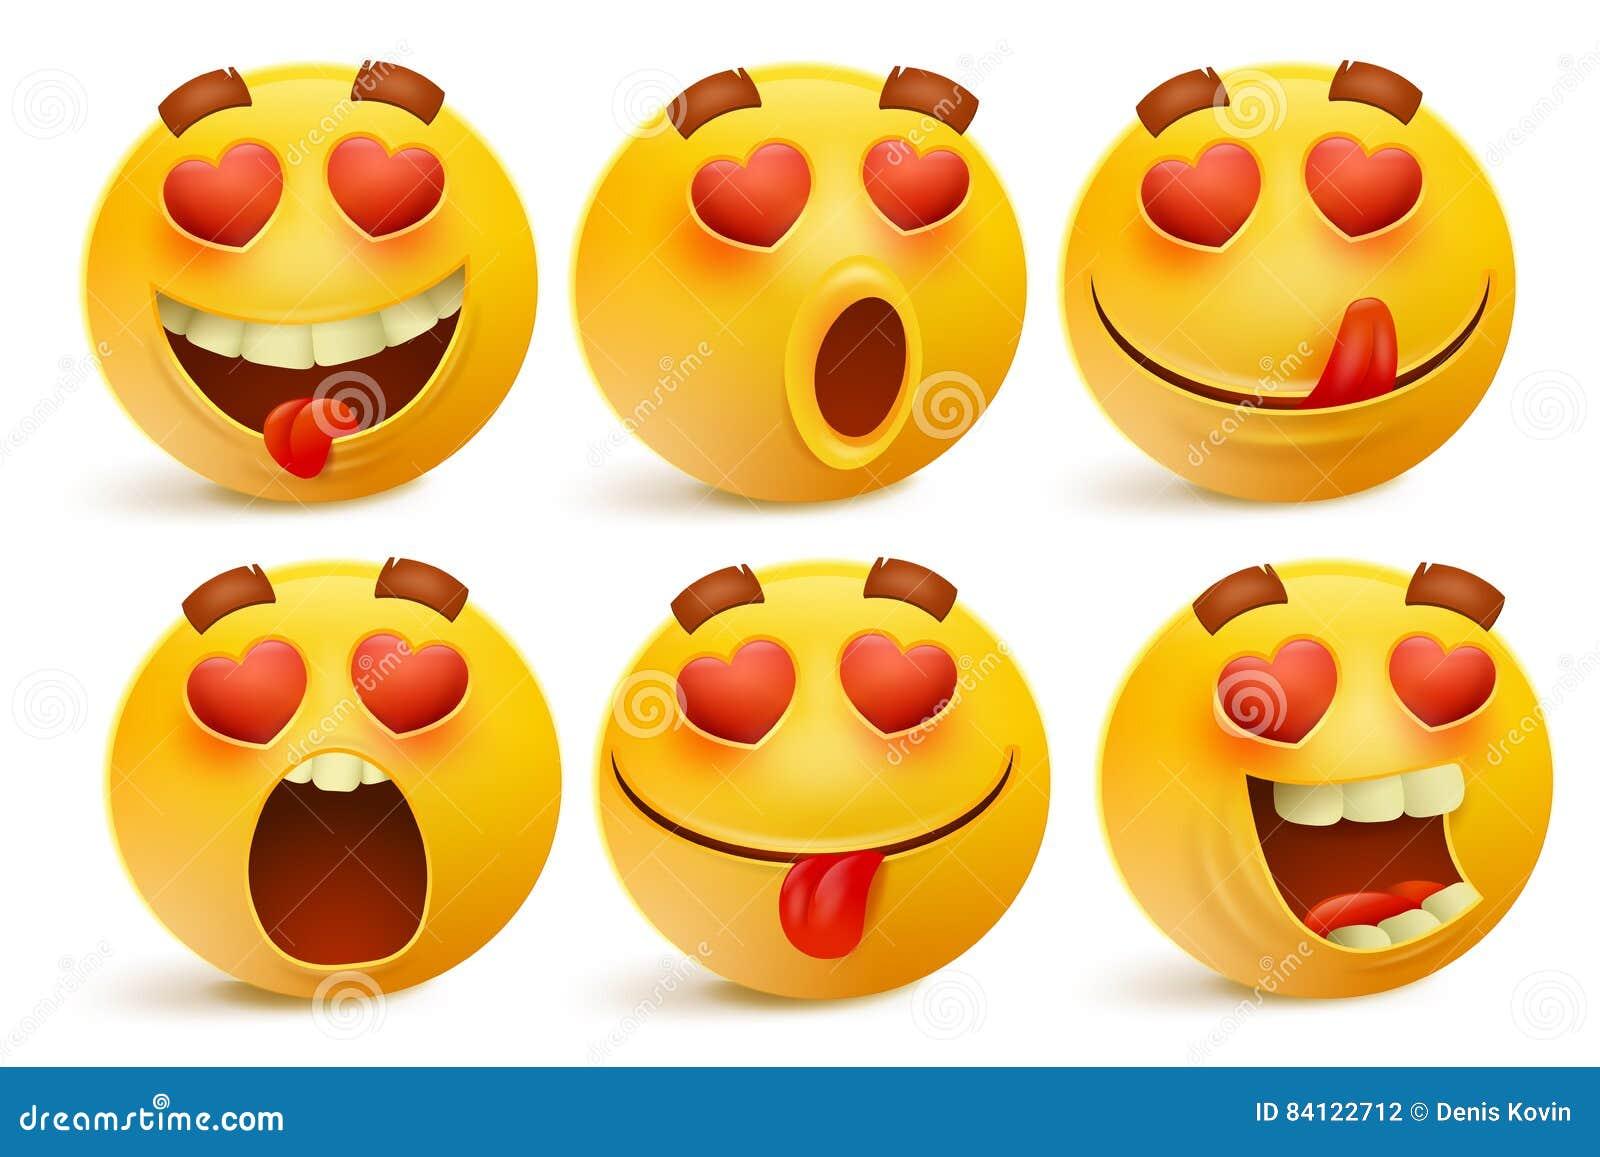 Valentines Day Emoticon Icons Love Emoji Set On White Background